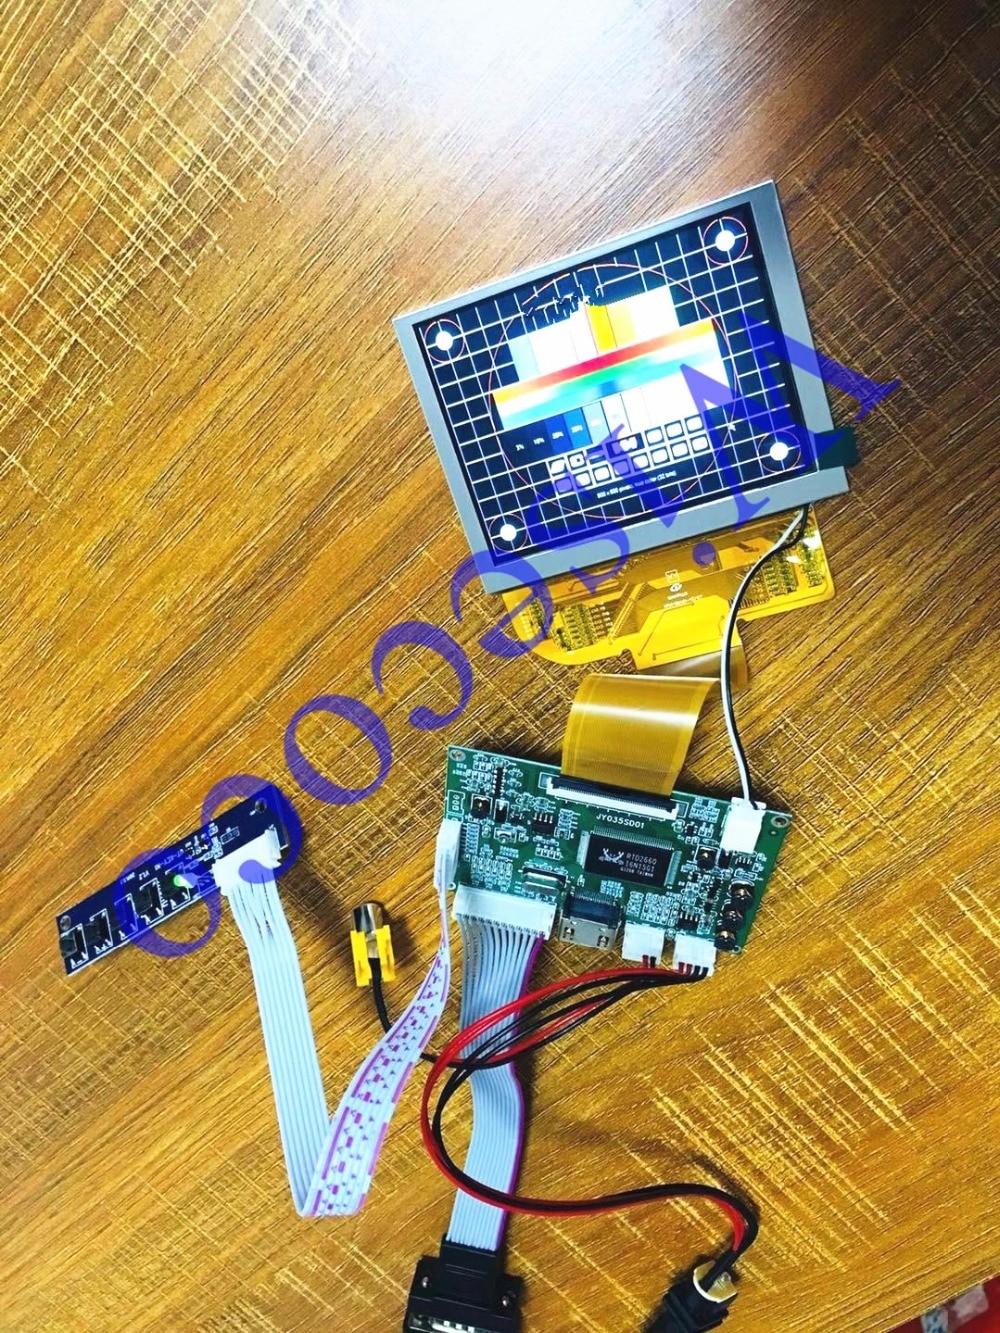 NEW 4:3 800*600 TFT 3.5 inch LCD screen display with VGA+HDMI+AV Controller driver boardNEW 4:3 800*600 TFT 3.5 inch LCD screen display with VGA+HDMI+AV Controller driver board